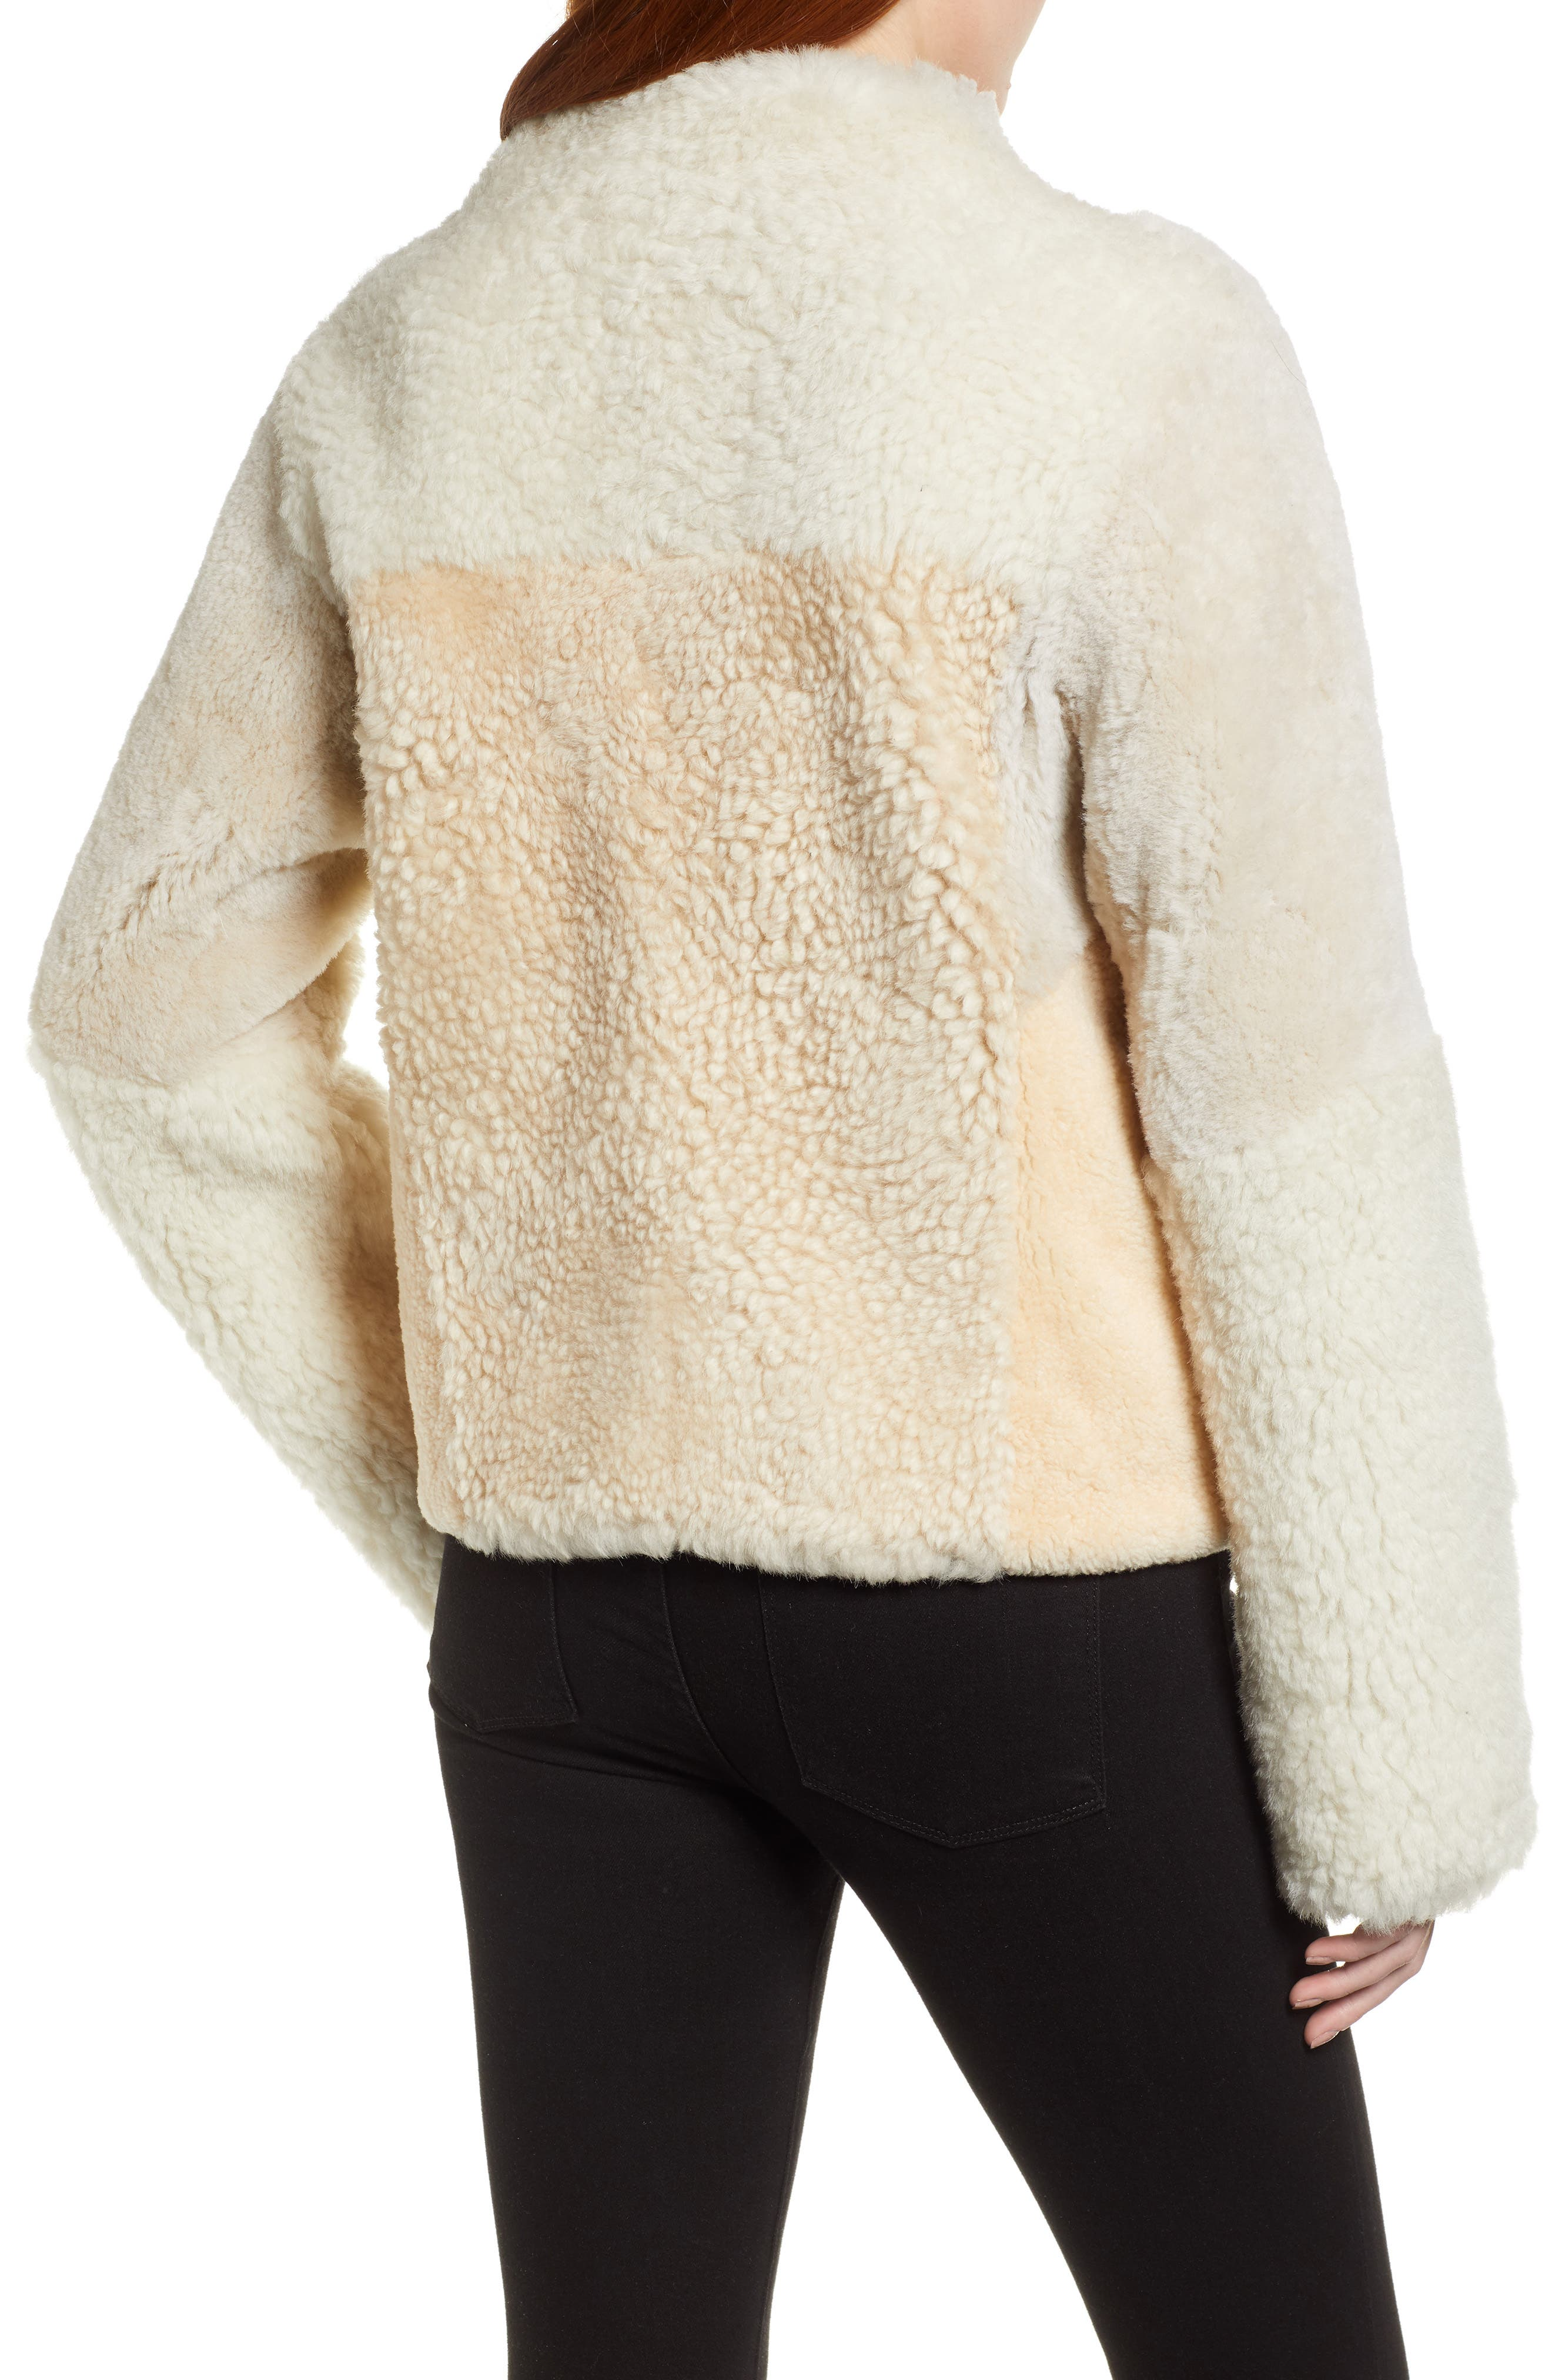 Patchwork Genuine Shearling Jacket,                             Alternate thumbnail 2, color,                             CREAM